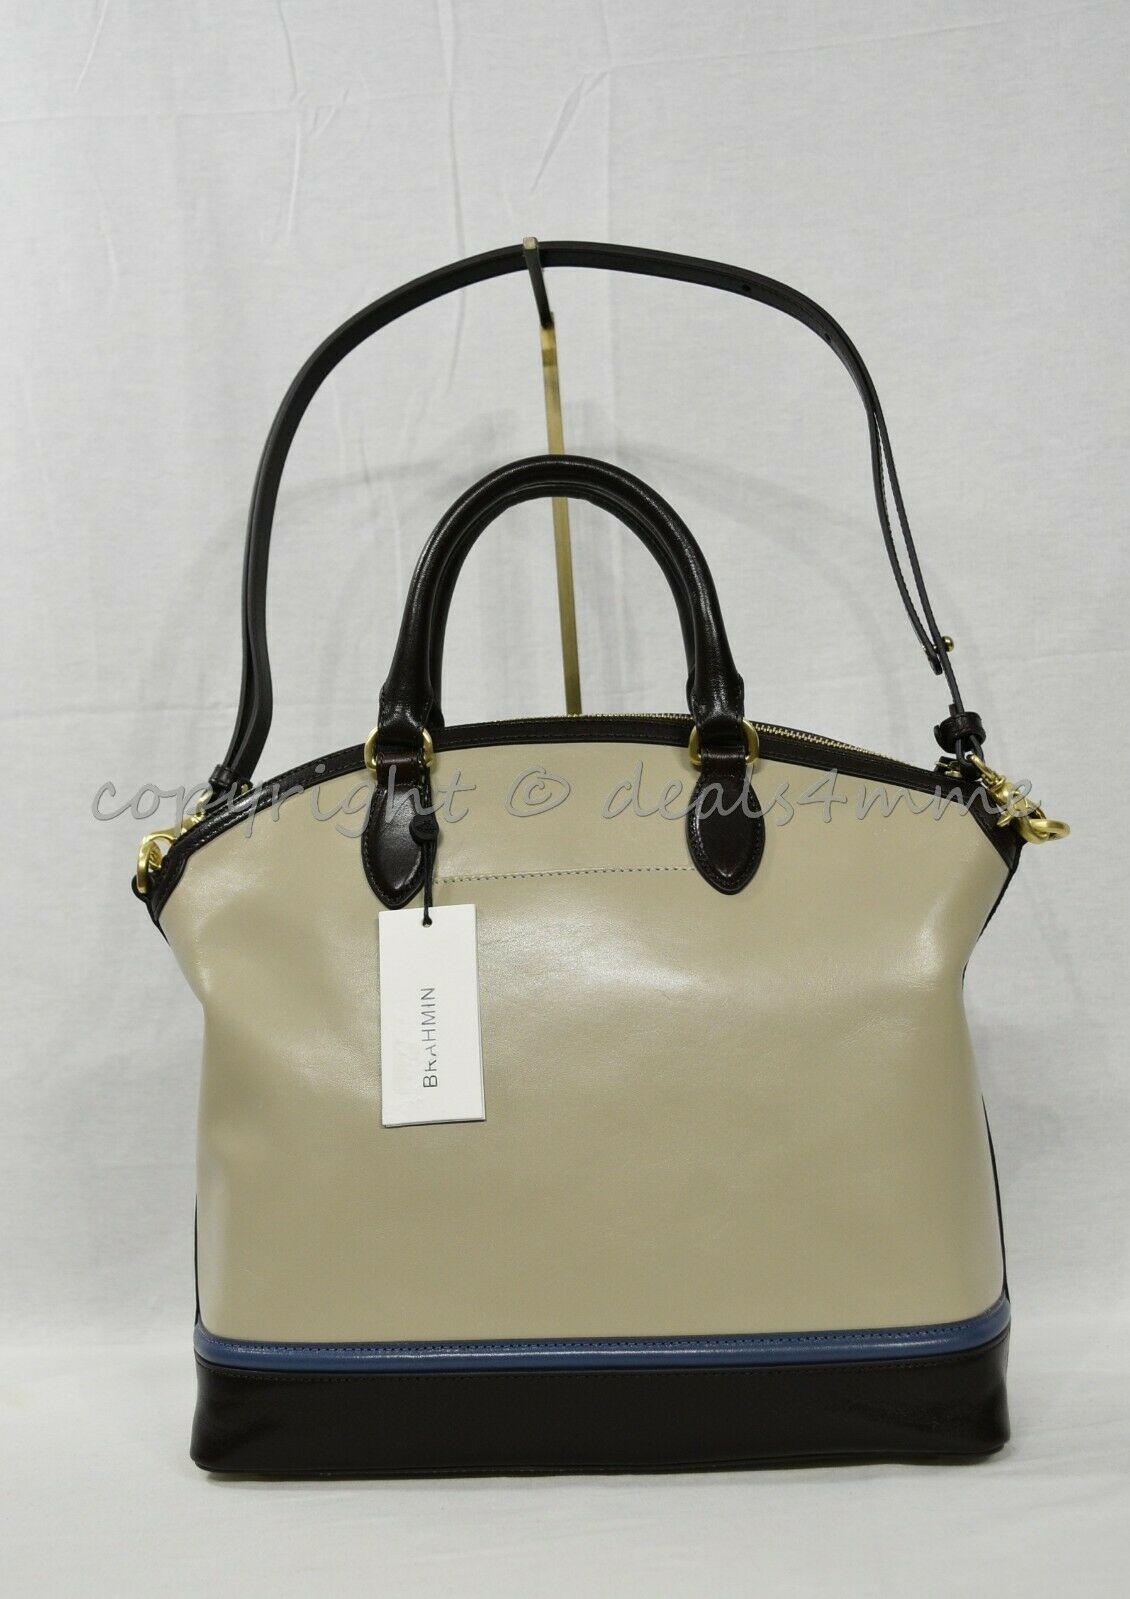 NWT Brahmin Large Duxbury Smooth Leather Satchel/Shoulder Bag in Sand Westport image 3